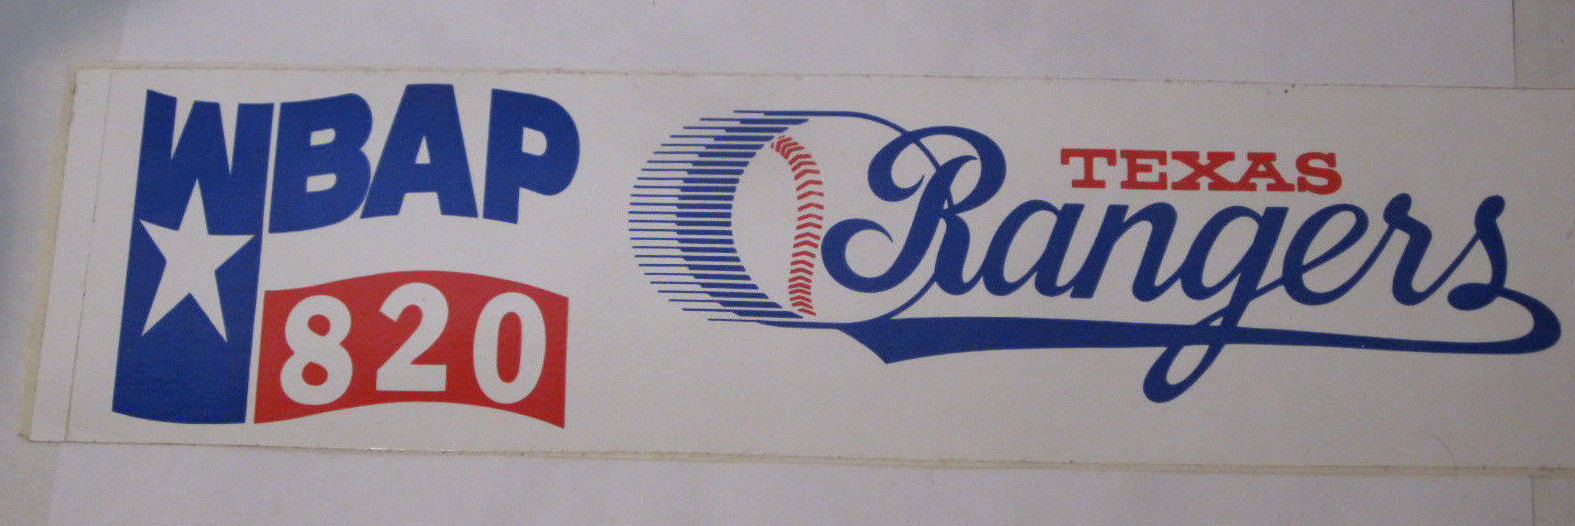 WBAP 820 Radio Texas Rangers 11.5